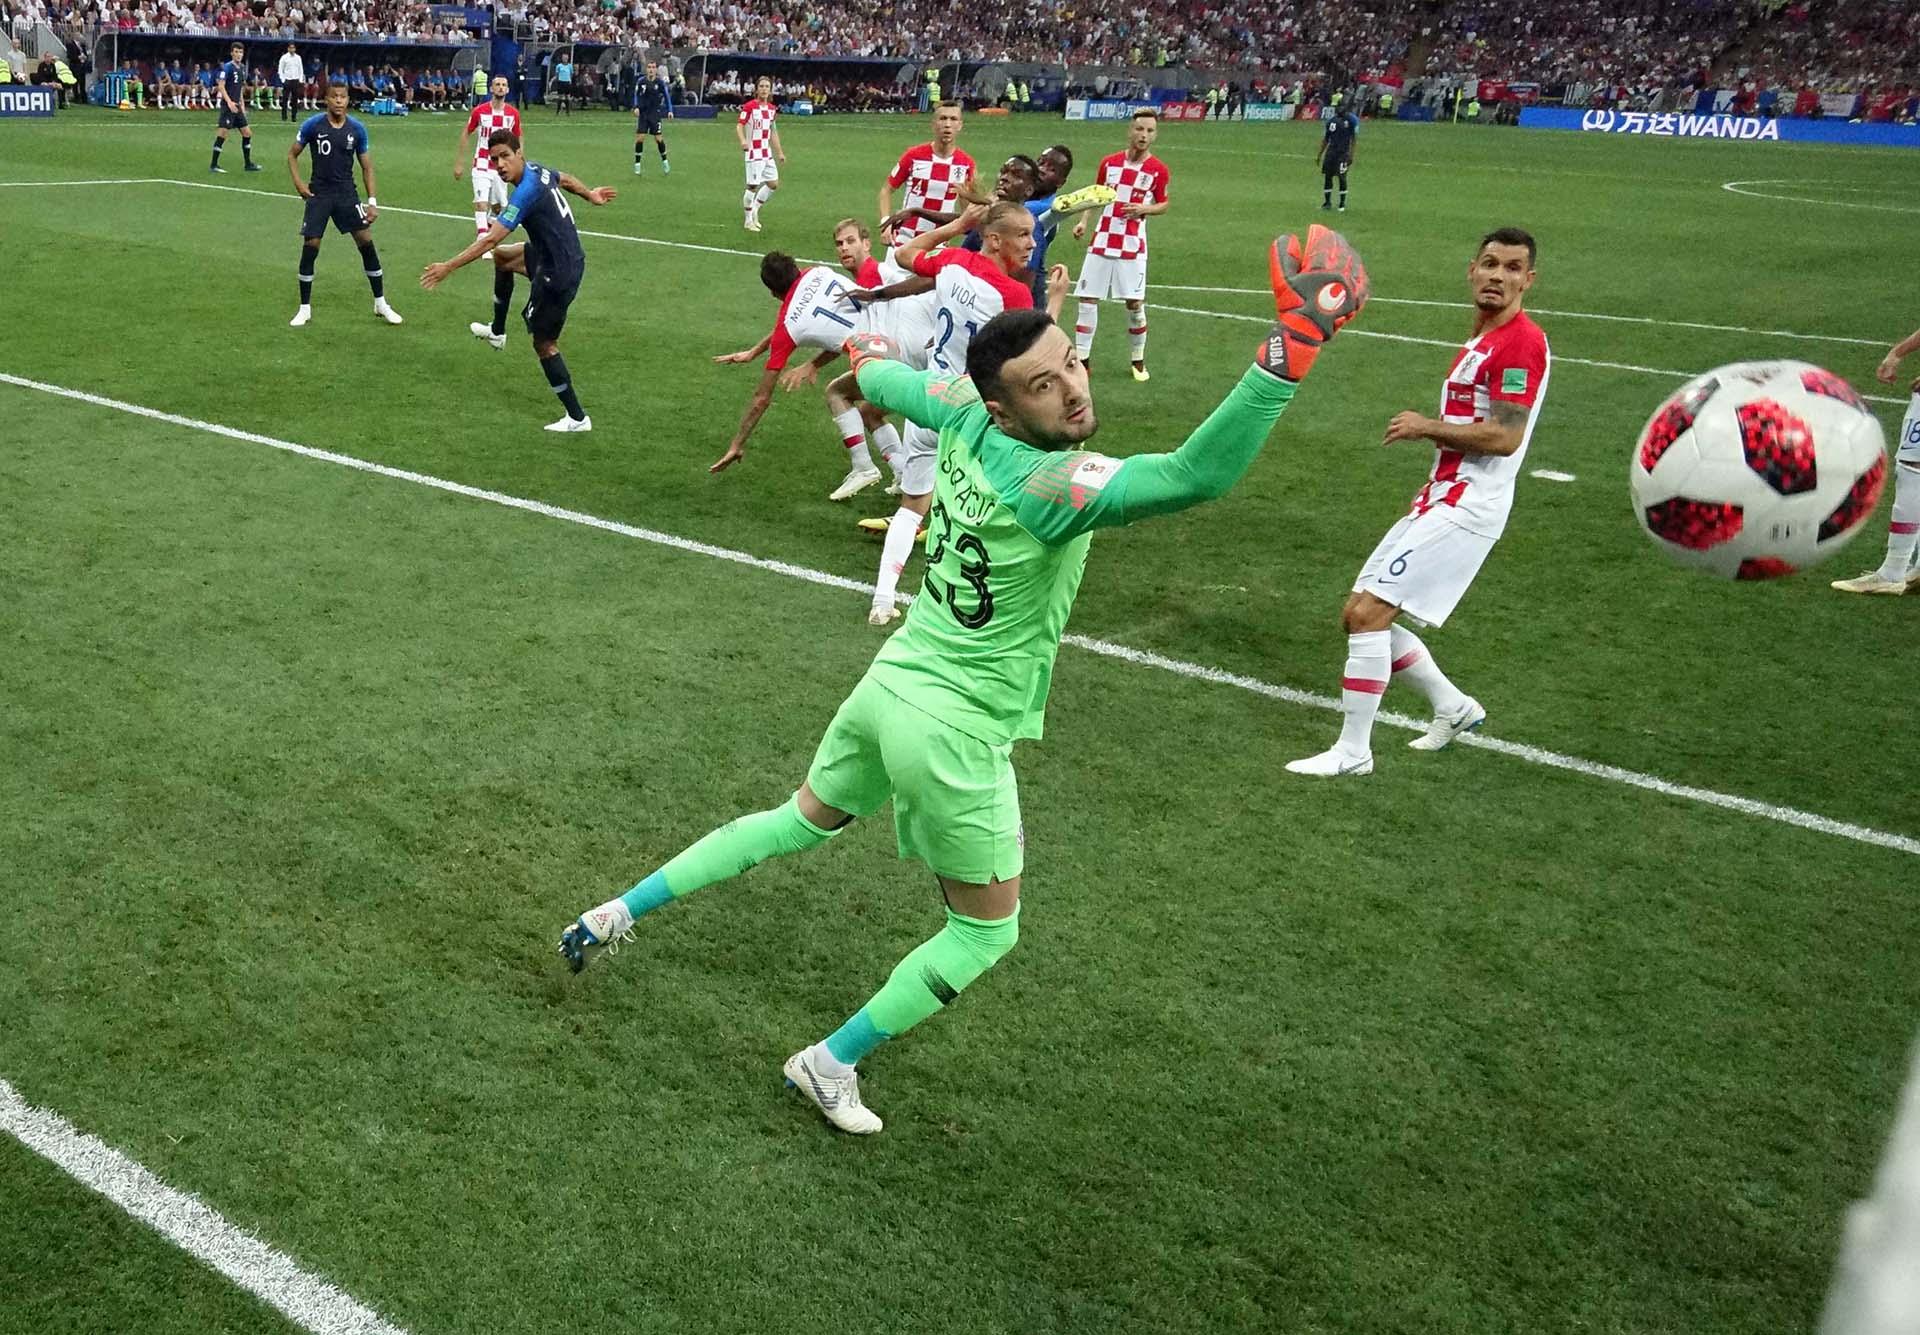 El 1-0 de Francia